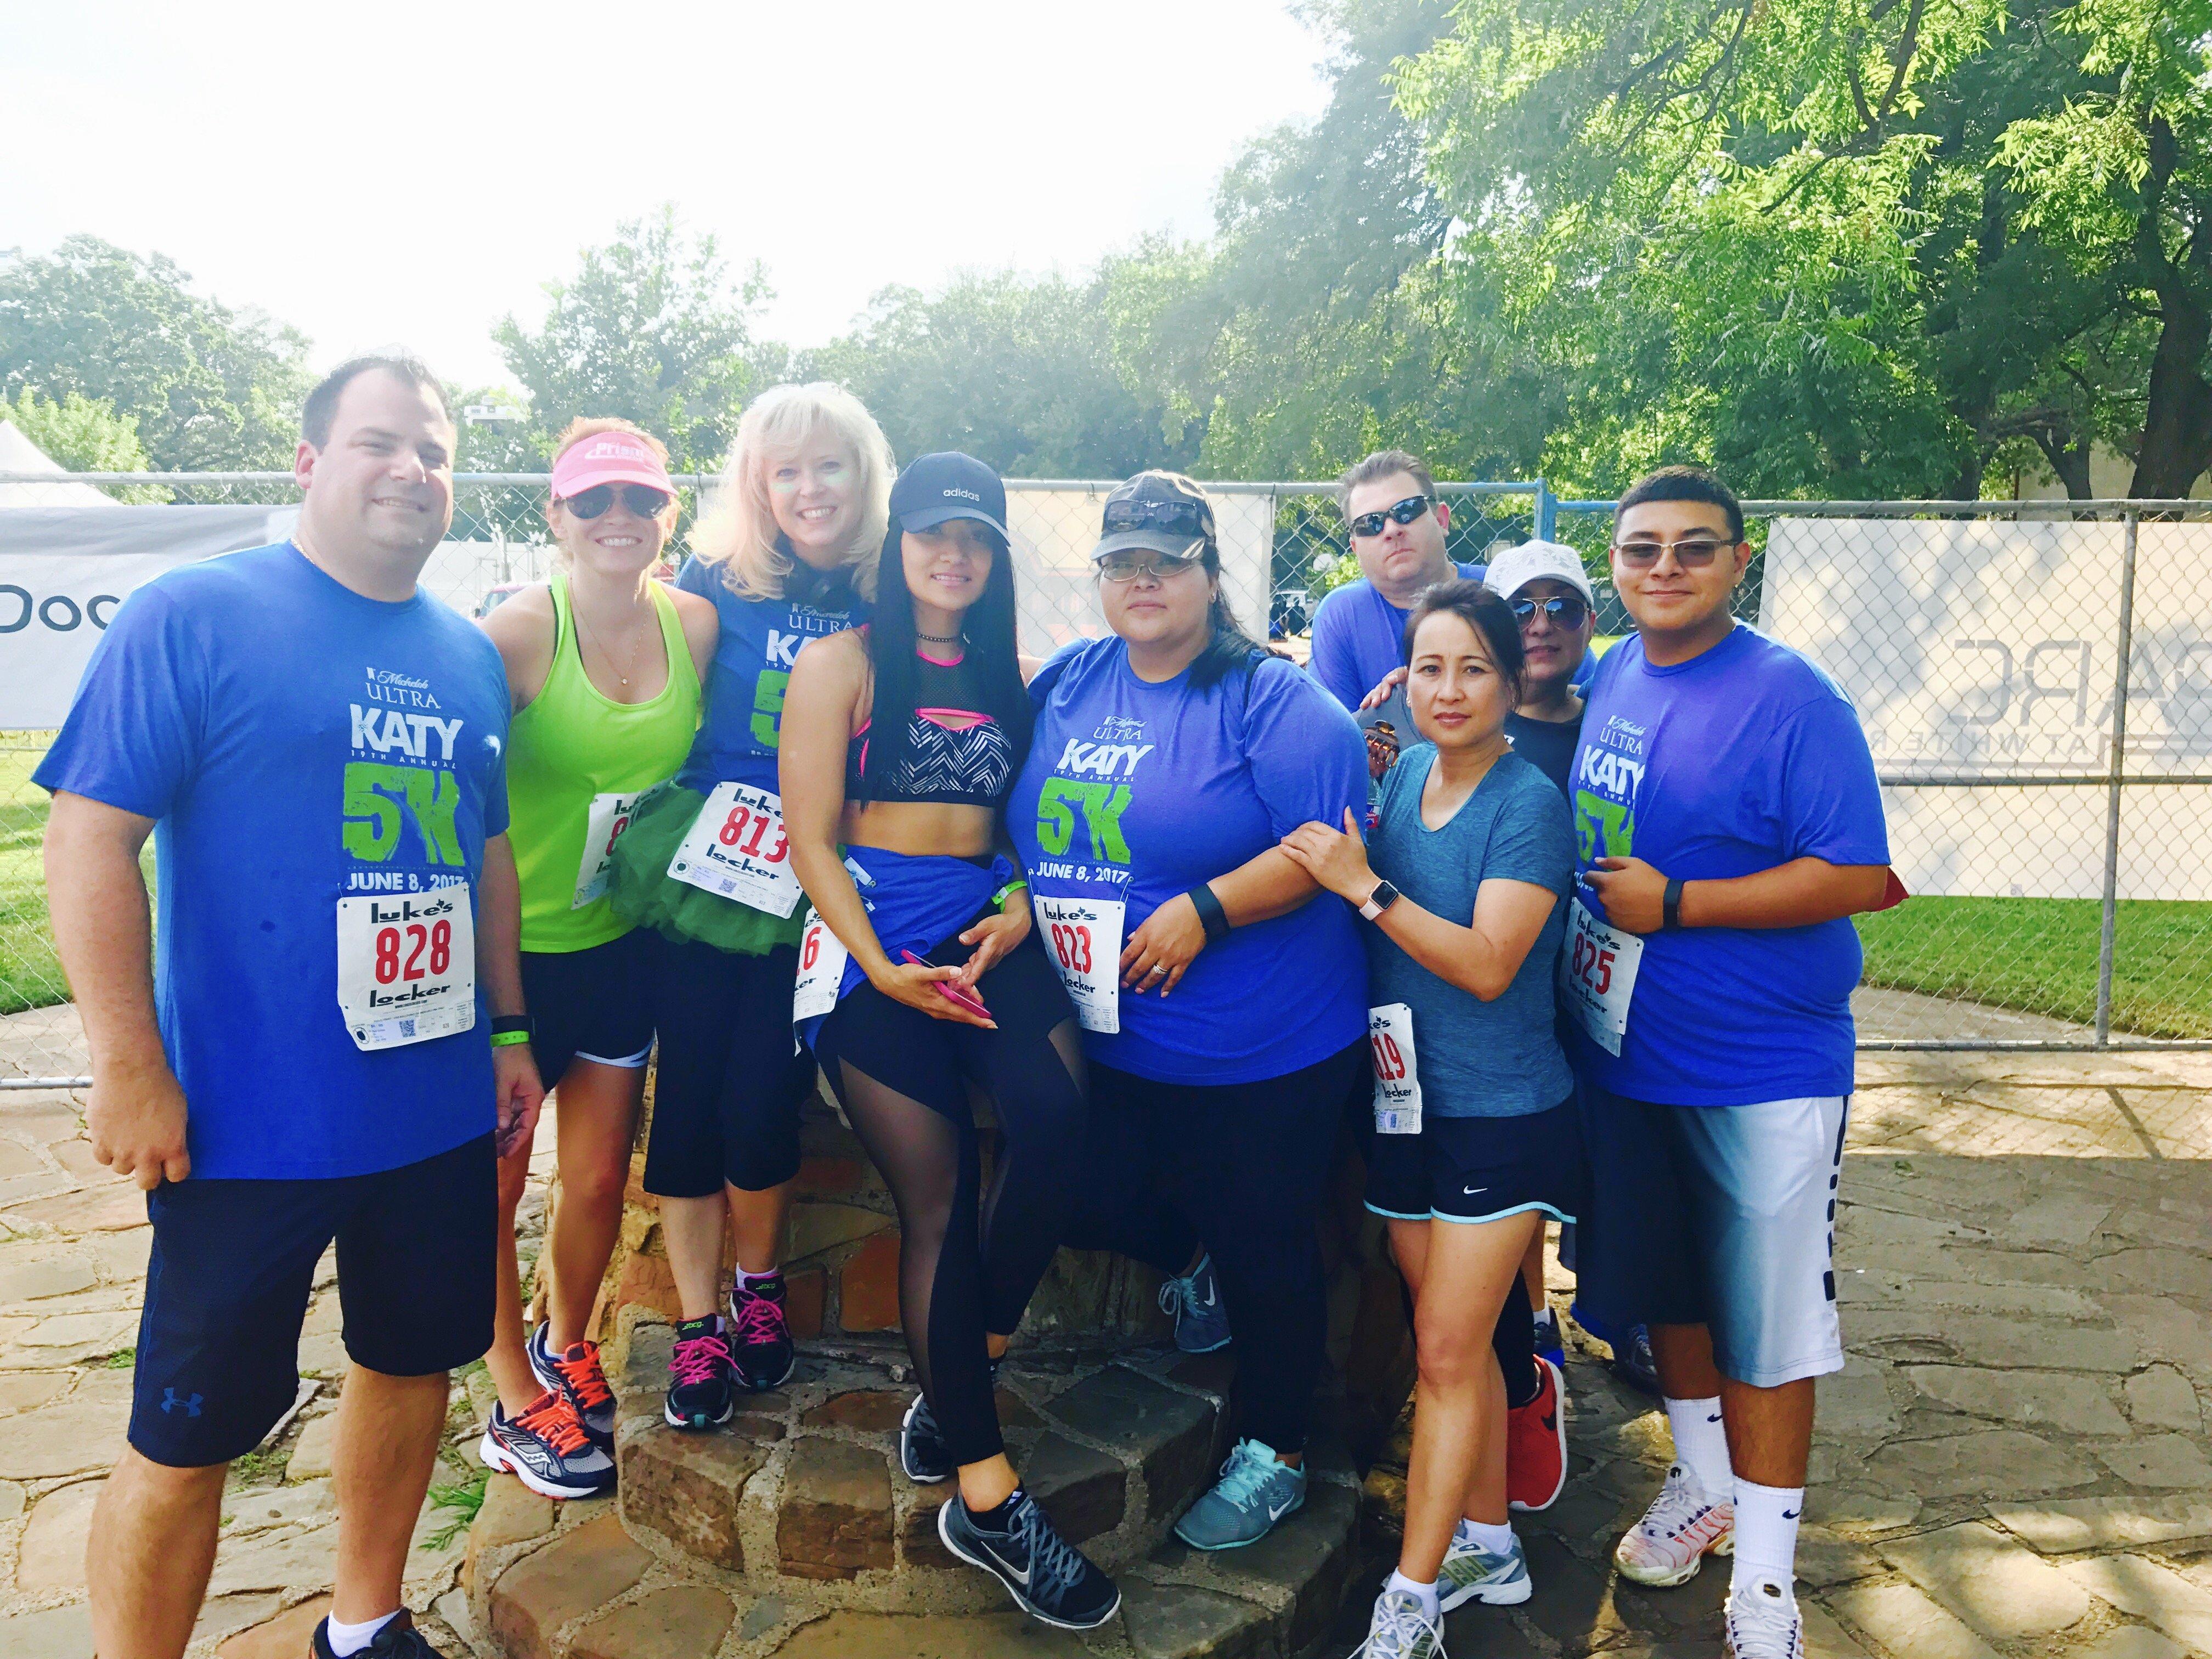 Friends of the Katy Trail 5K Run